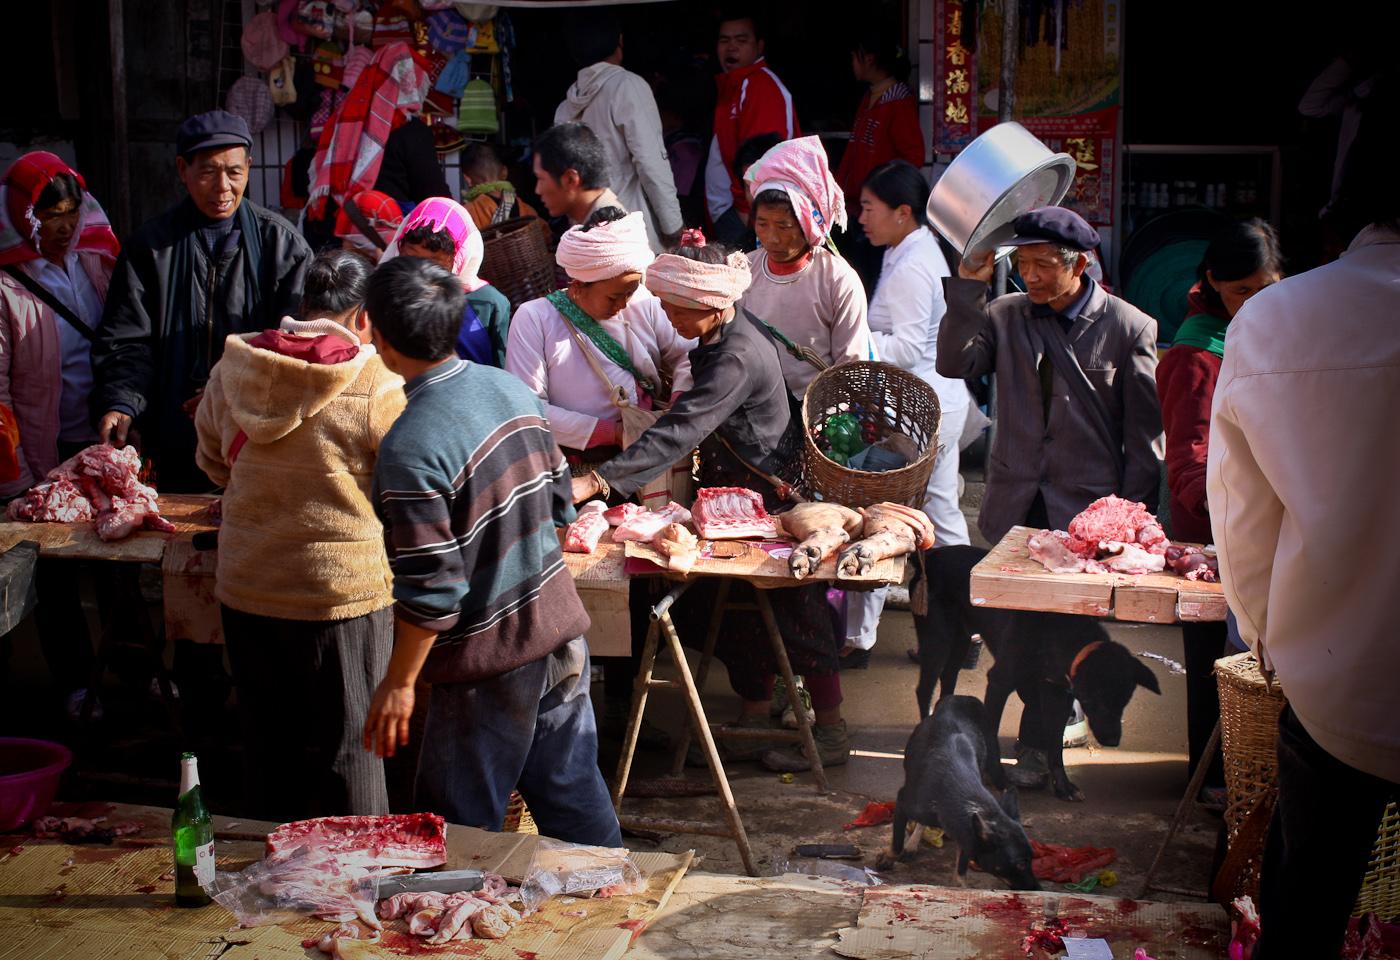 20081225 Jinghong Thursrday market XBN (54)